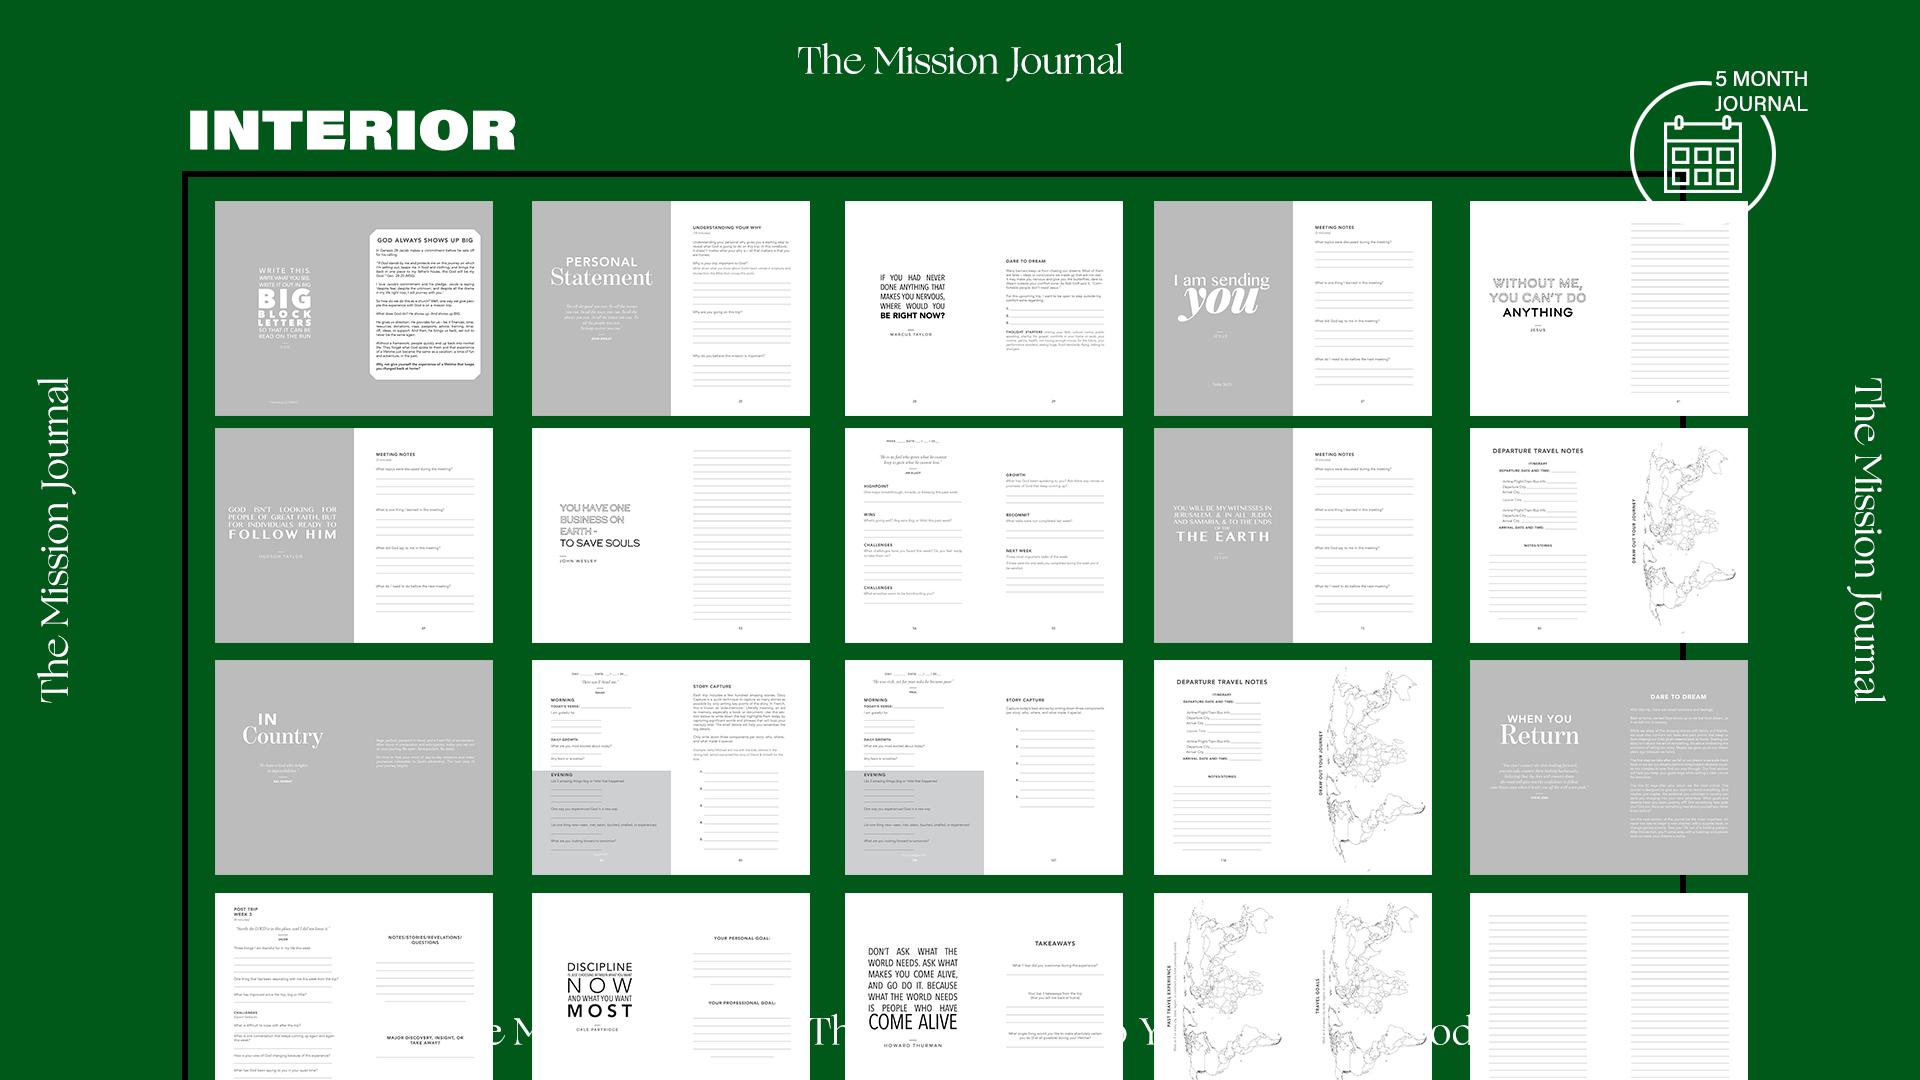 Mission Trip JournalArtboard 1 copy 26.jpg